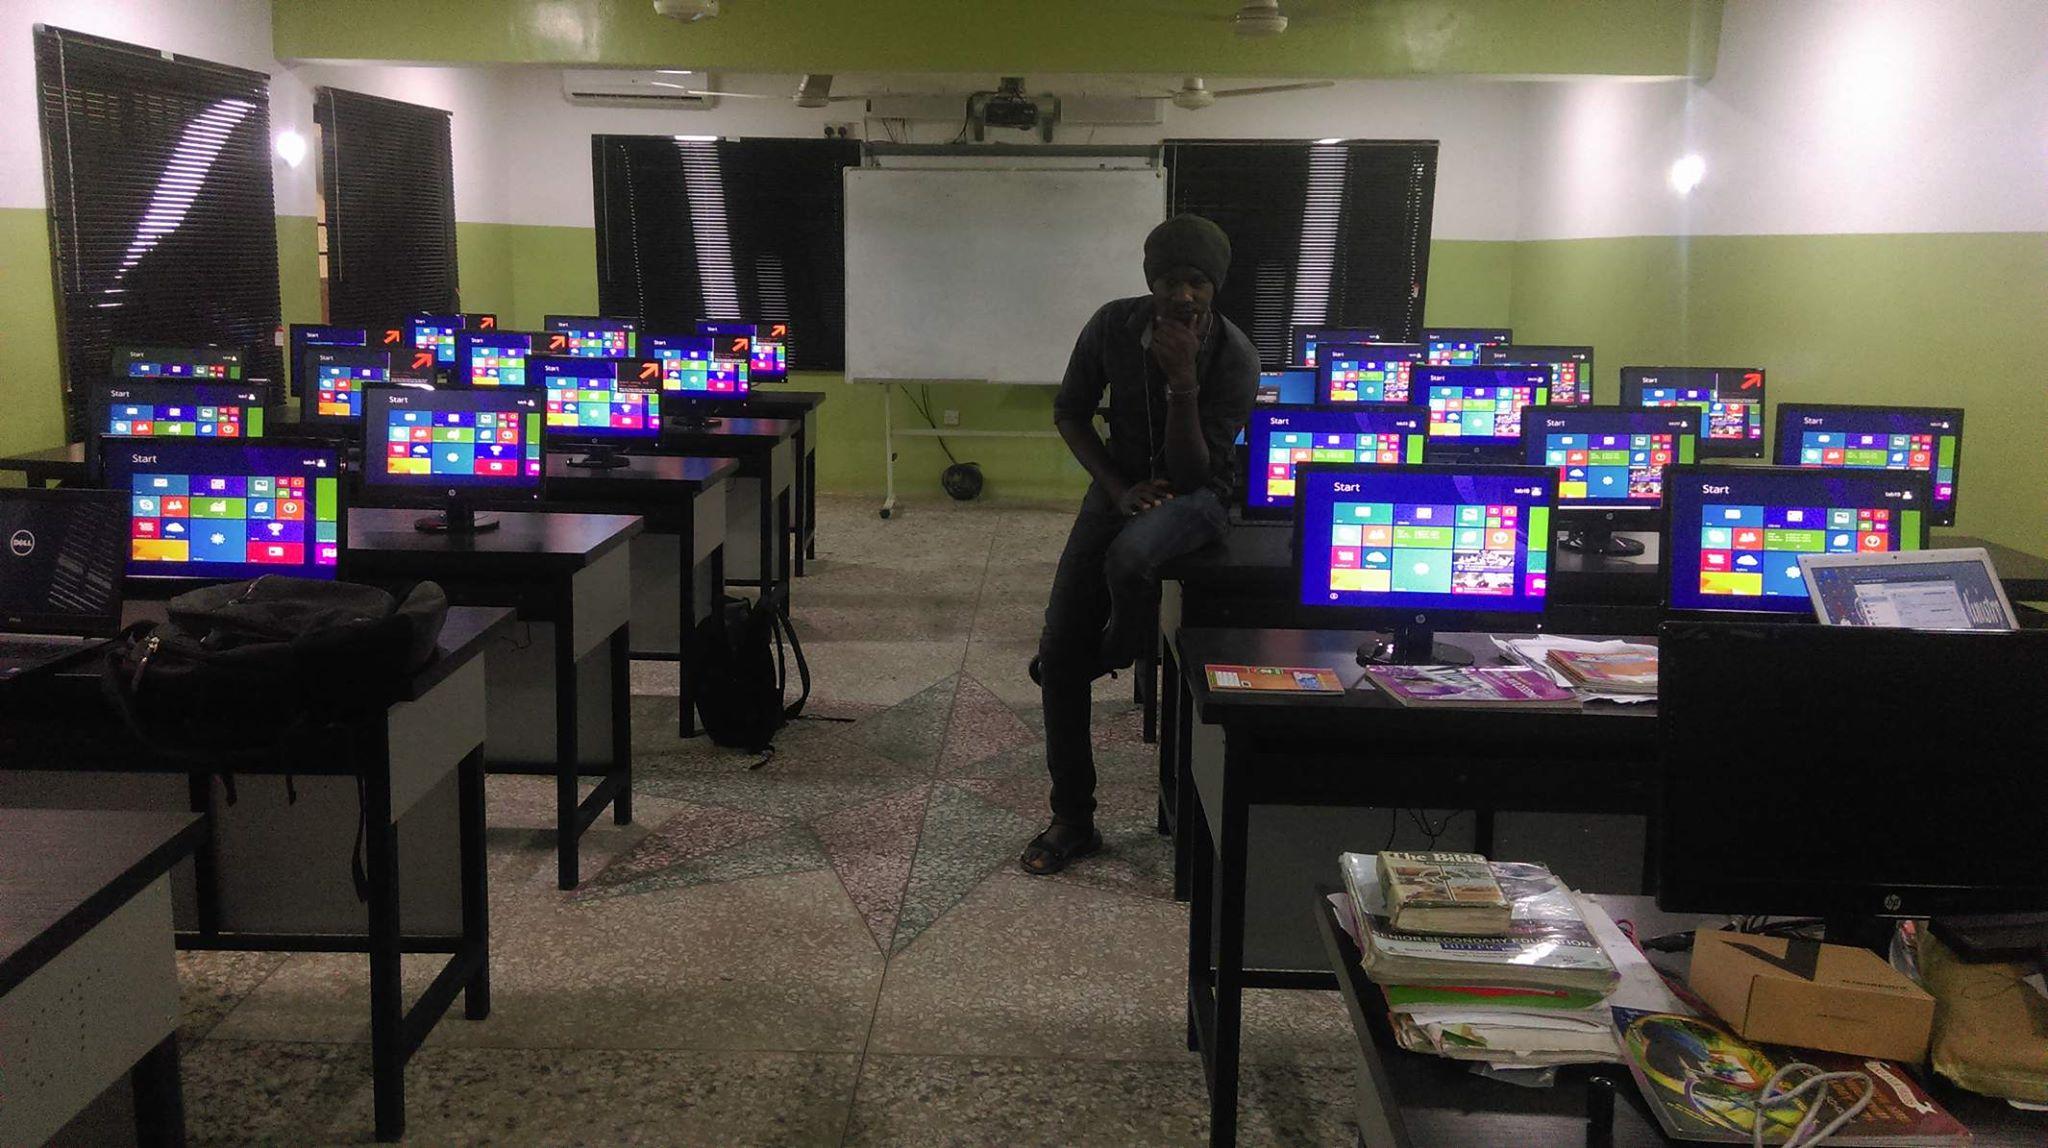 Graceland-International-School-in-Nigeria3.jpg